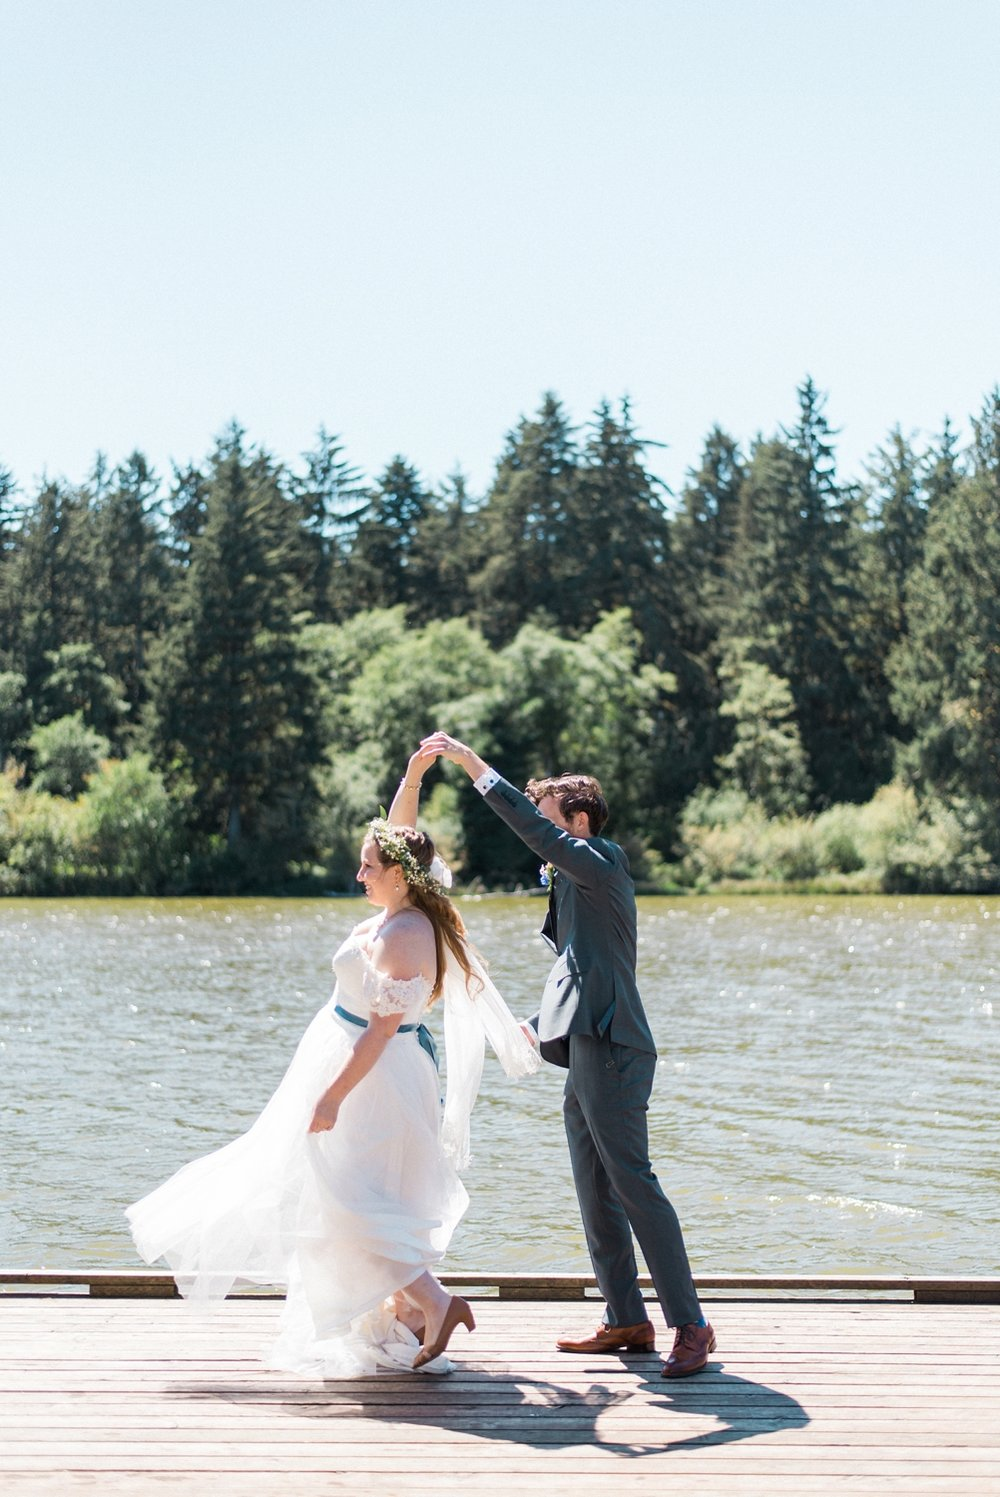 astoria-wedding-fort-stevens-oregon-kc-shelley-marie-photo-0360_cr.jpg